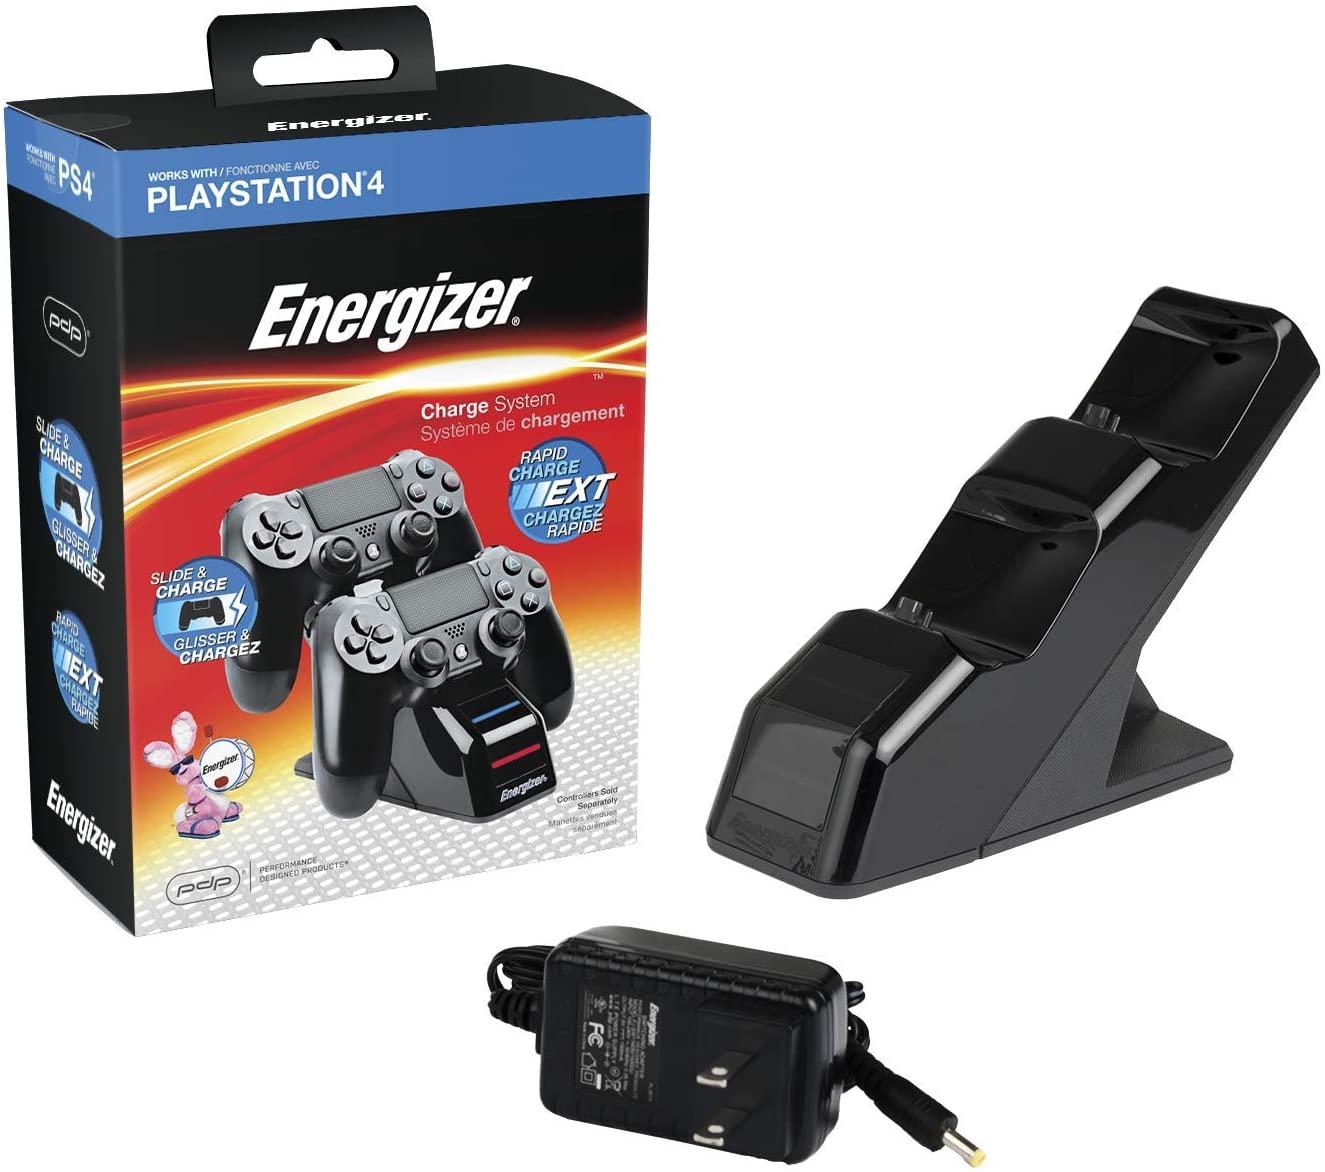 Station de charge 2 manettes PS4 Energizer